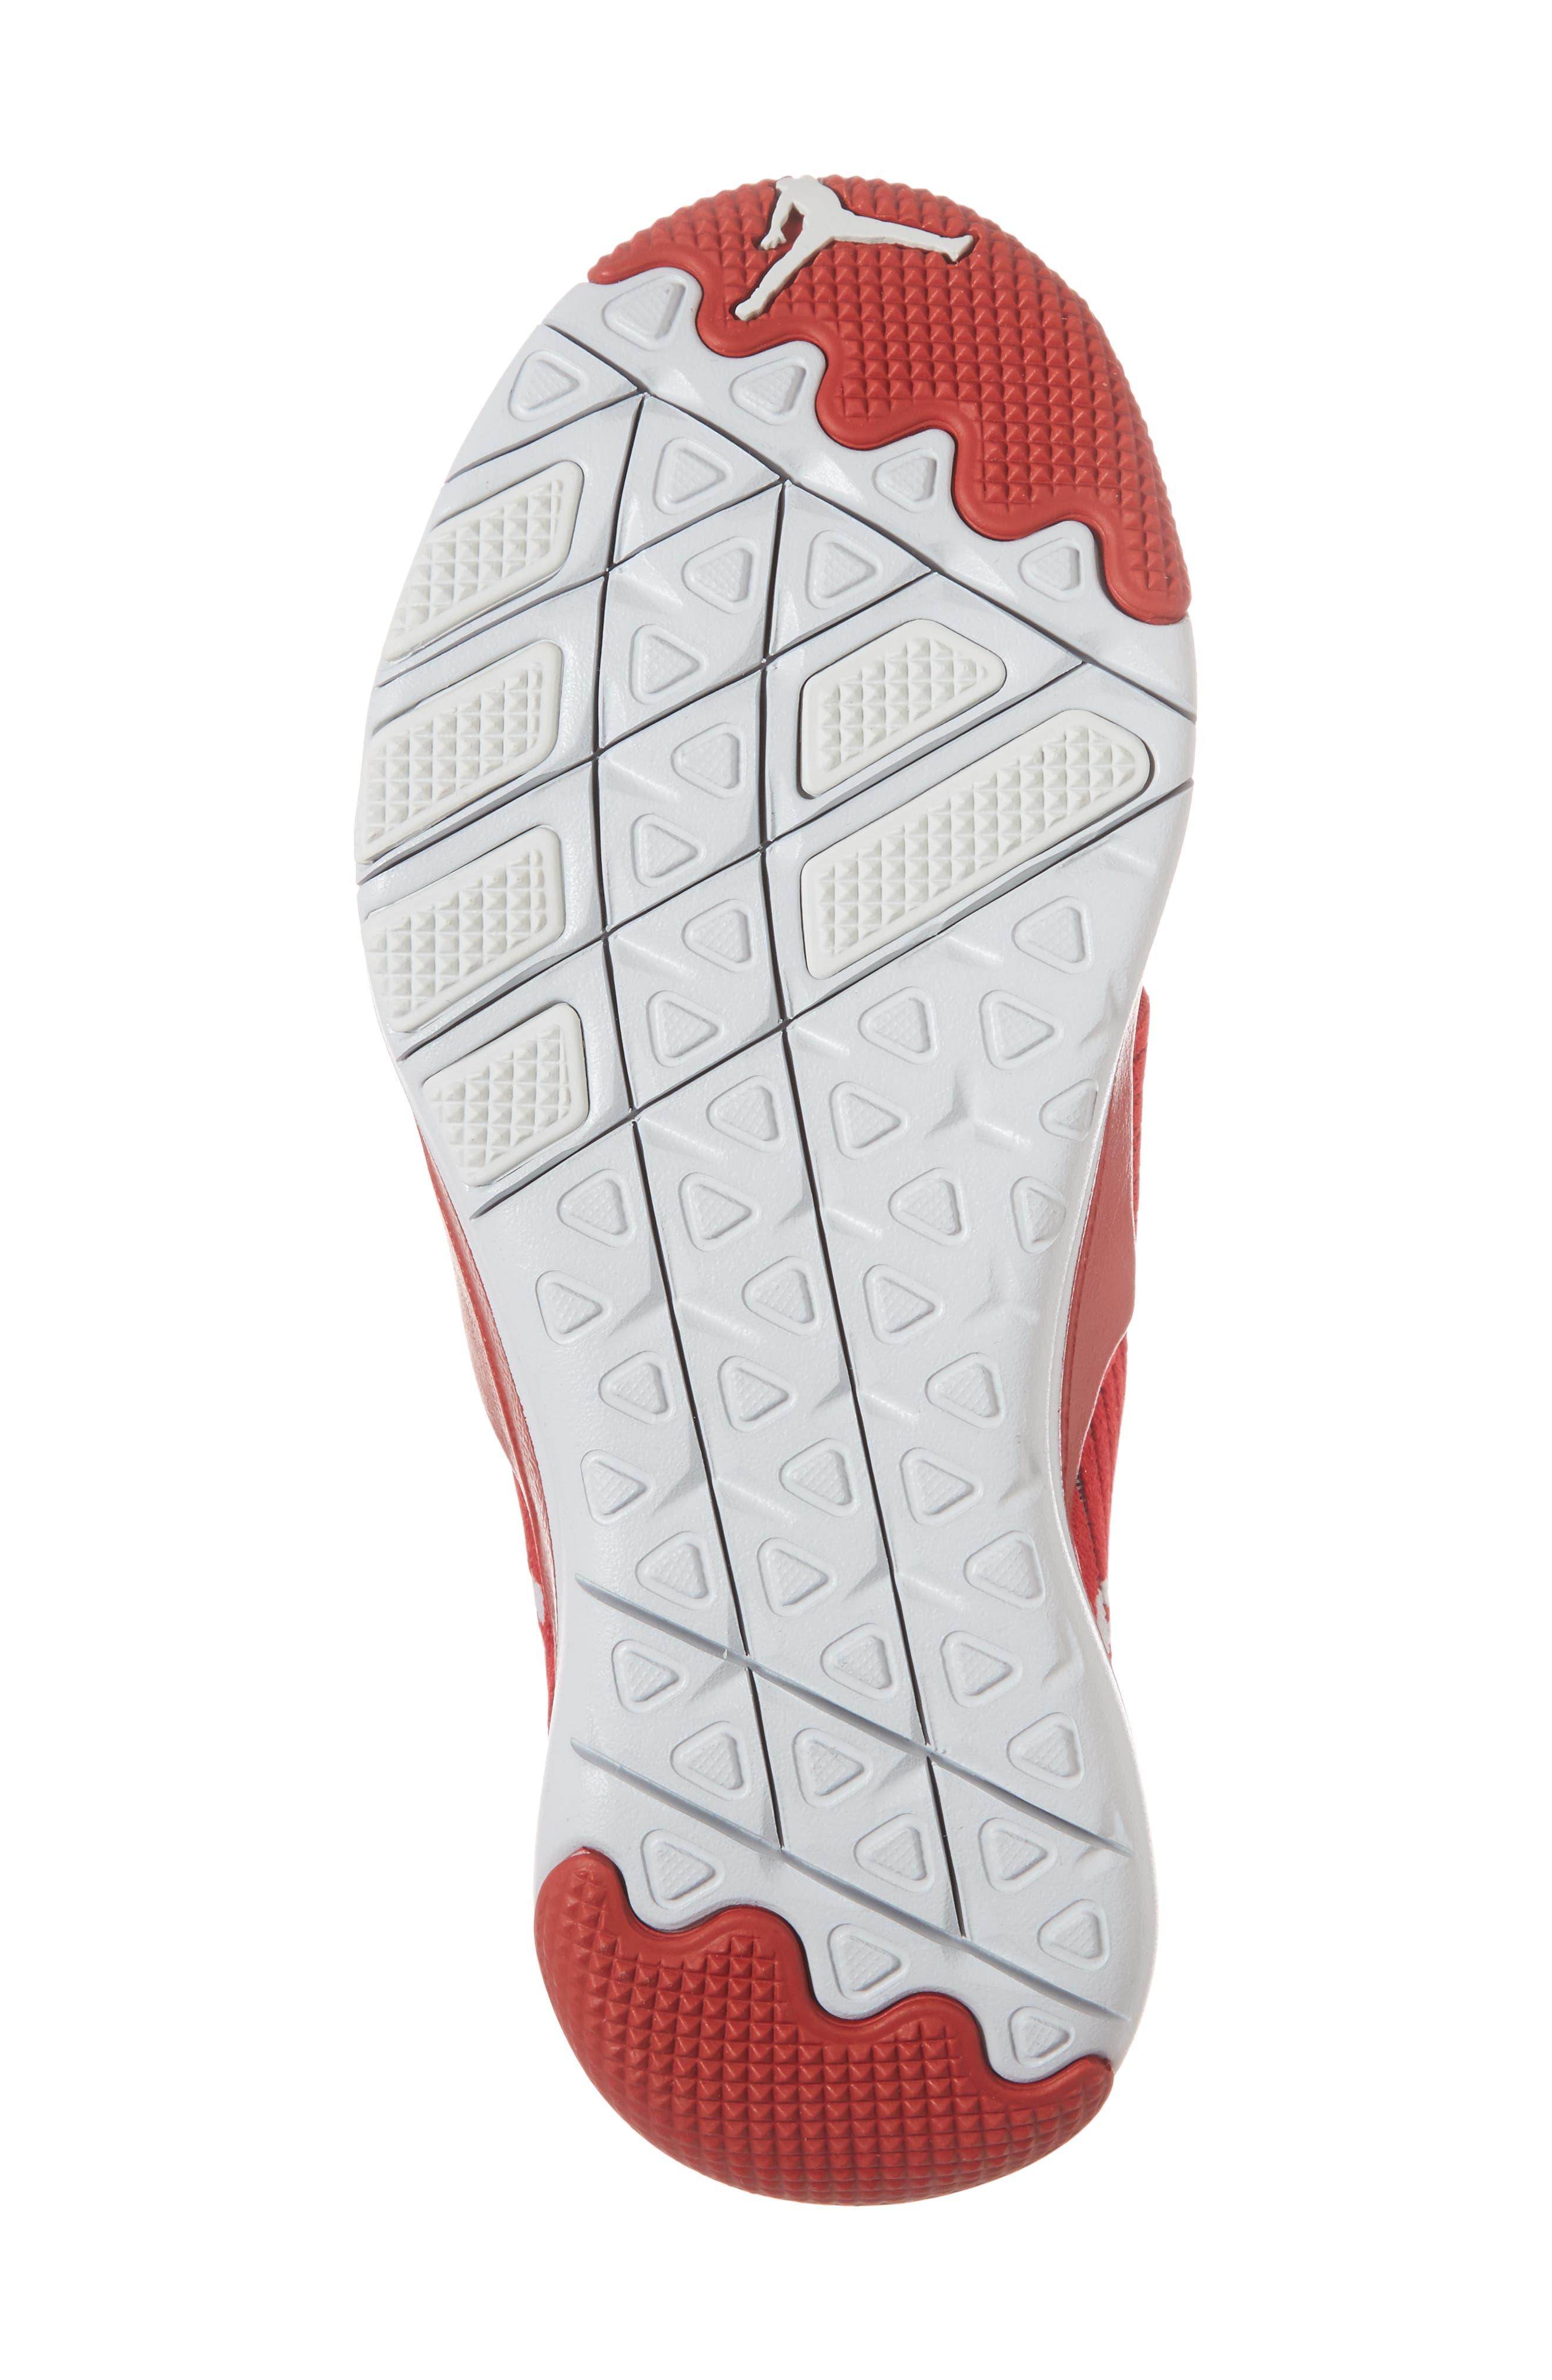 Trainer Pro Training Shoe,                             Alternate thumbnail 6, color,                             Gym Red/ Pure Platinum